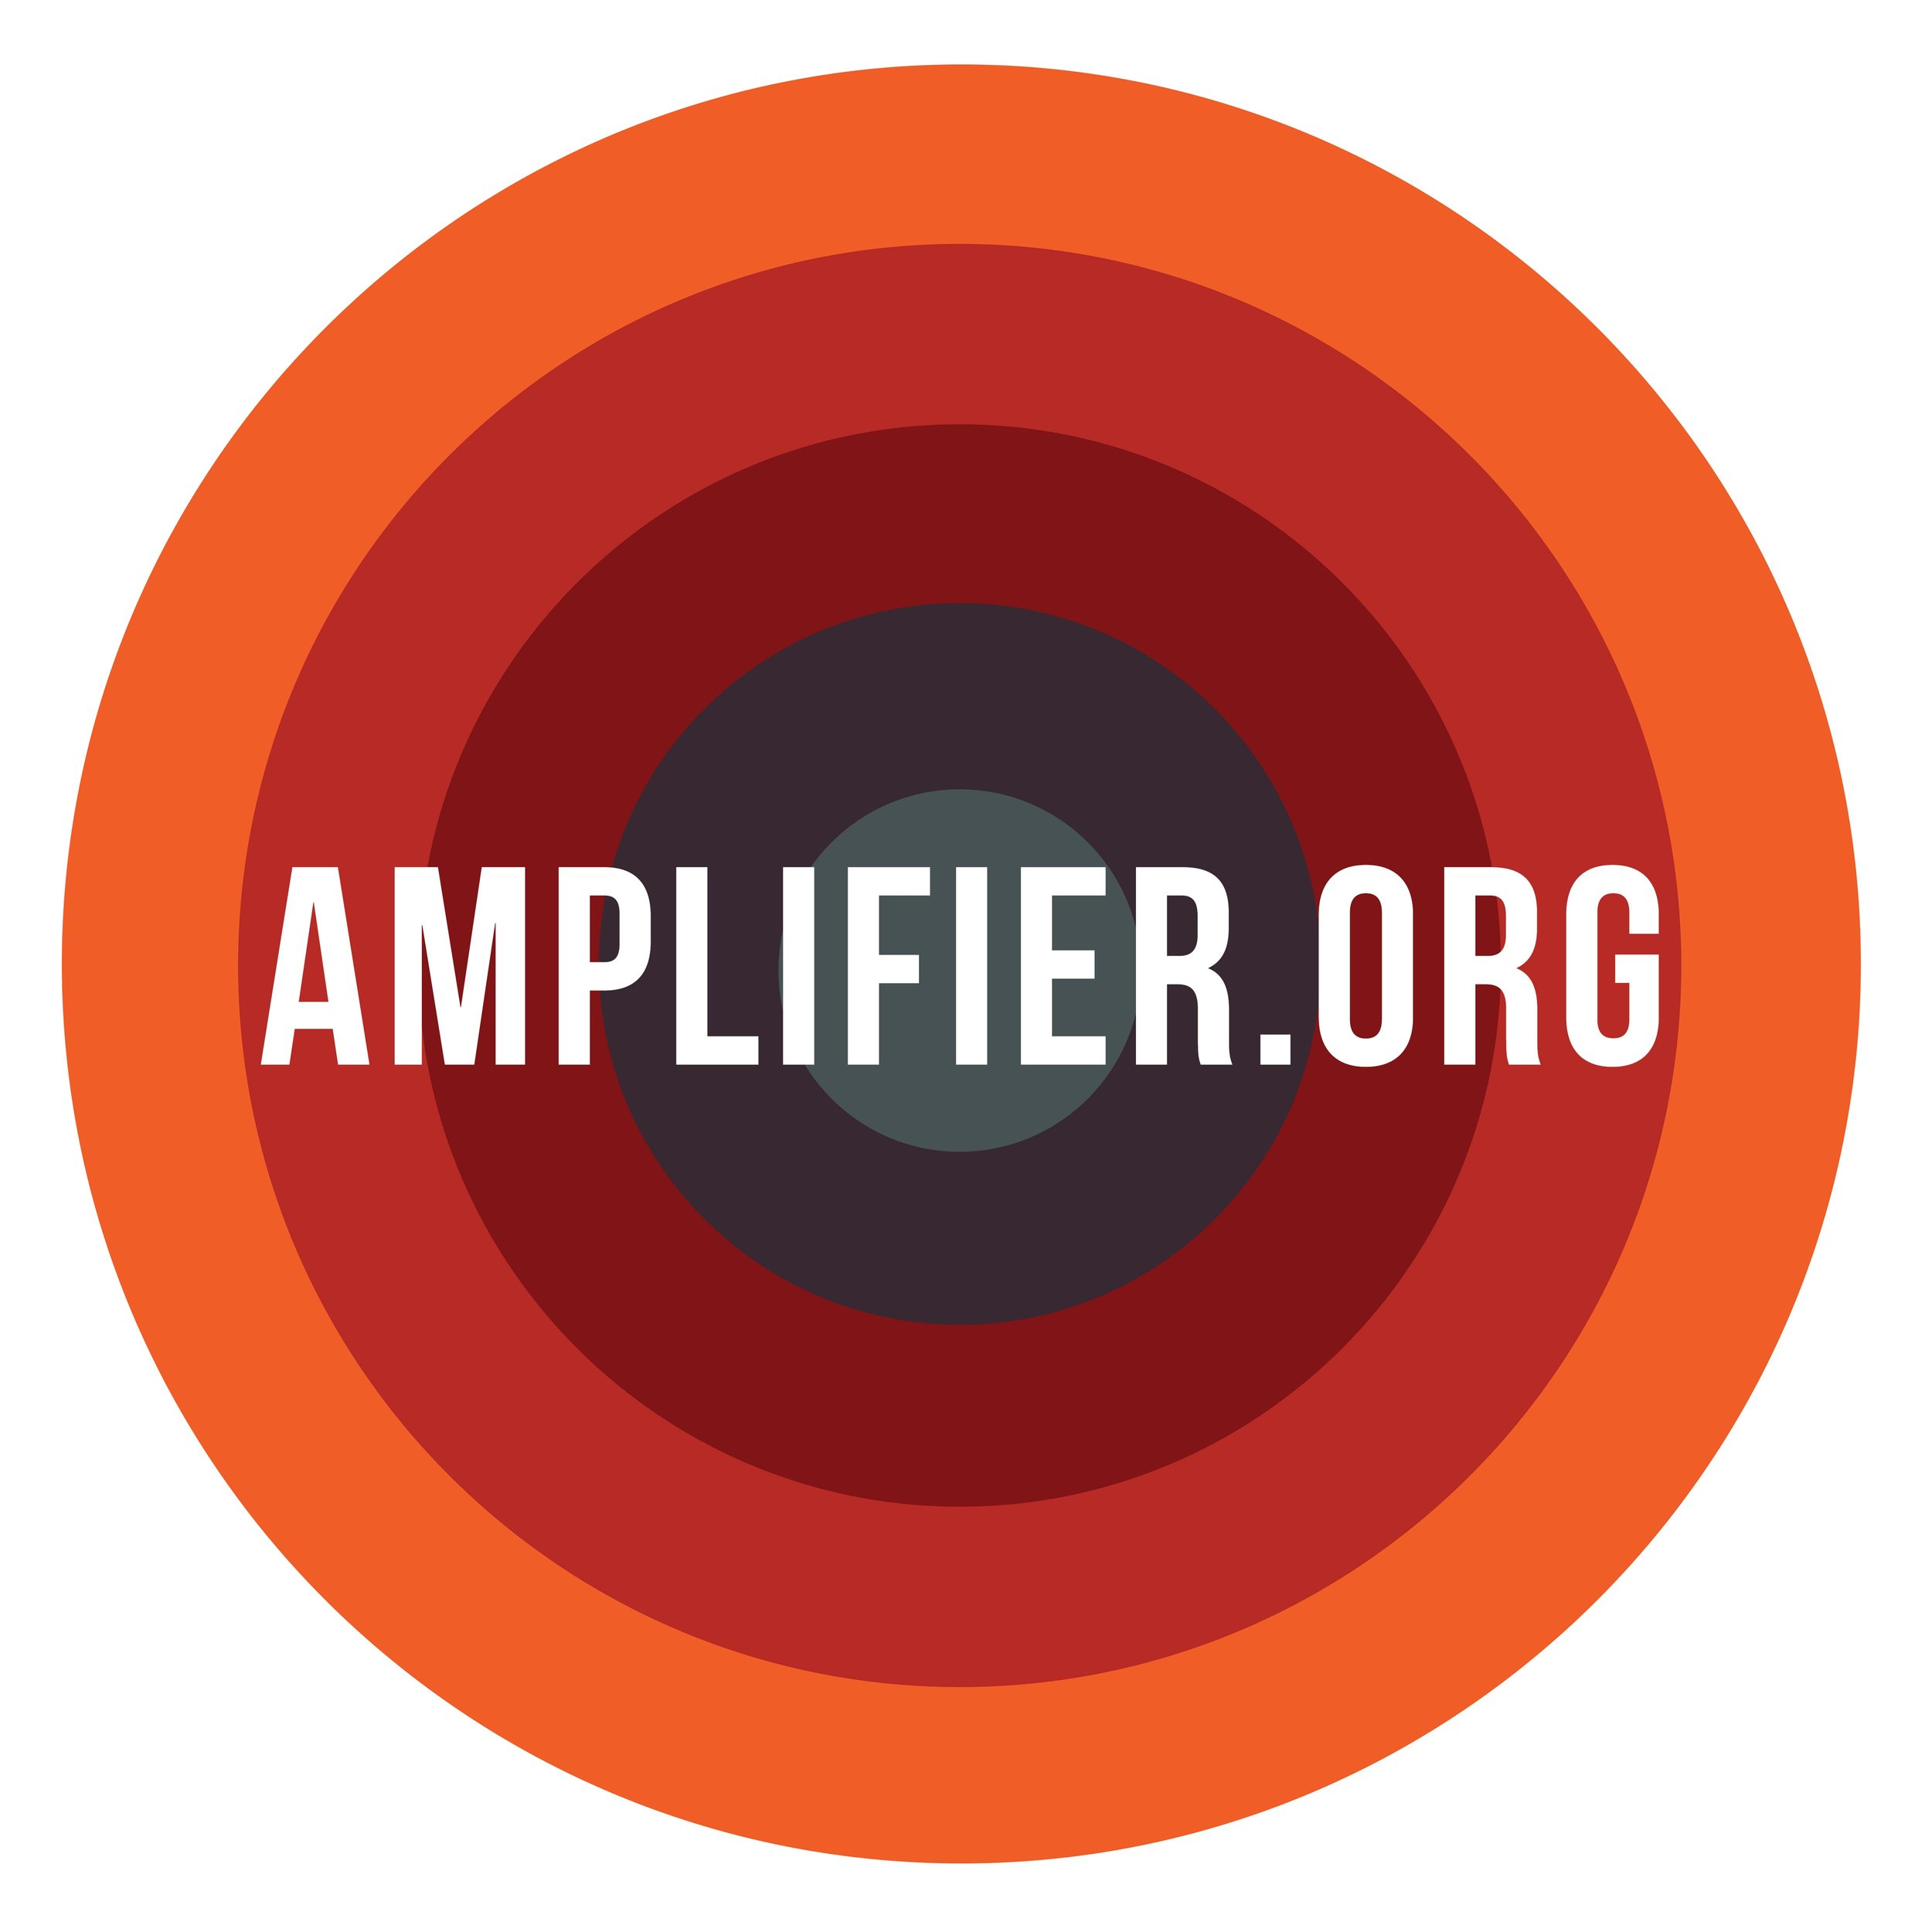 Amplifier.org.jpg